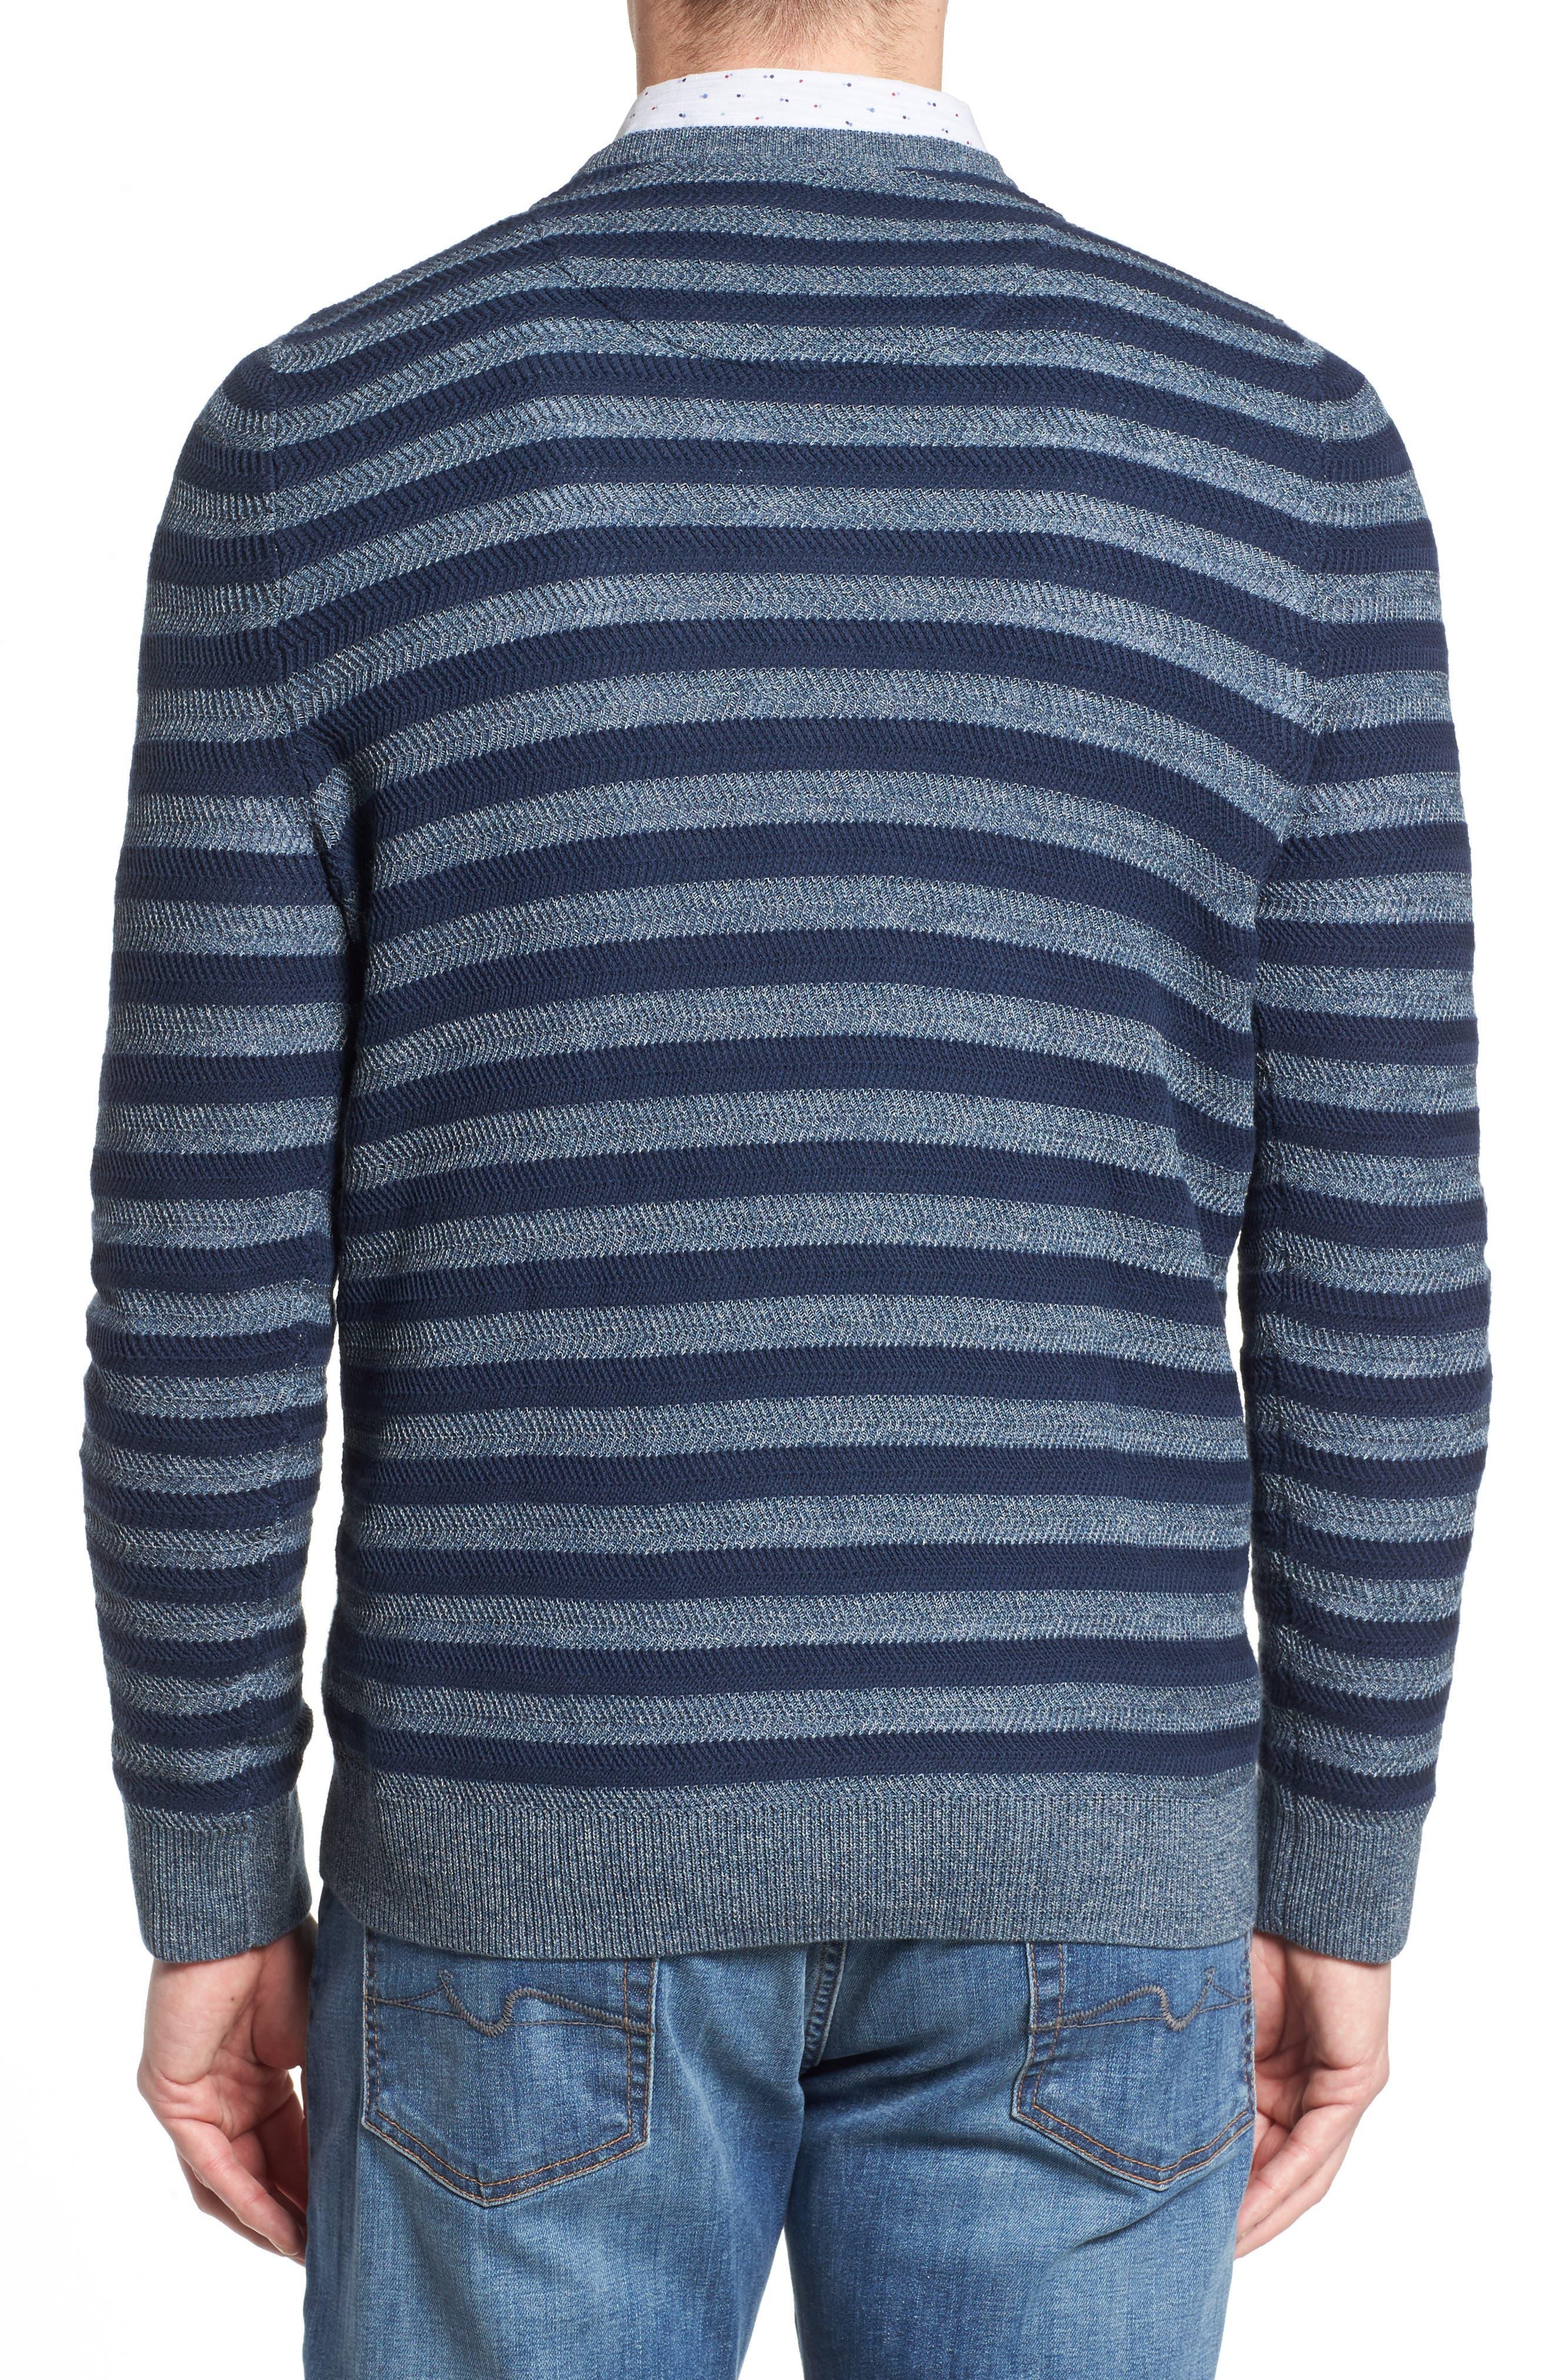 Stripe Cotton Blend Sweater,                             Alternate thumbnail 2, color,                             Navy Iris Stripe